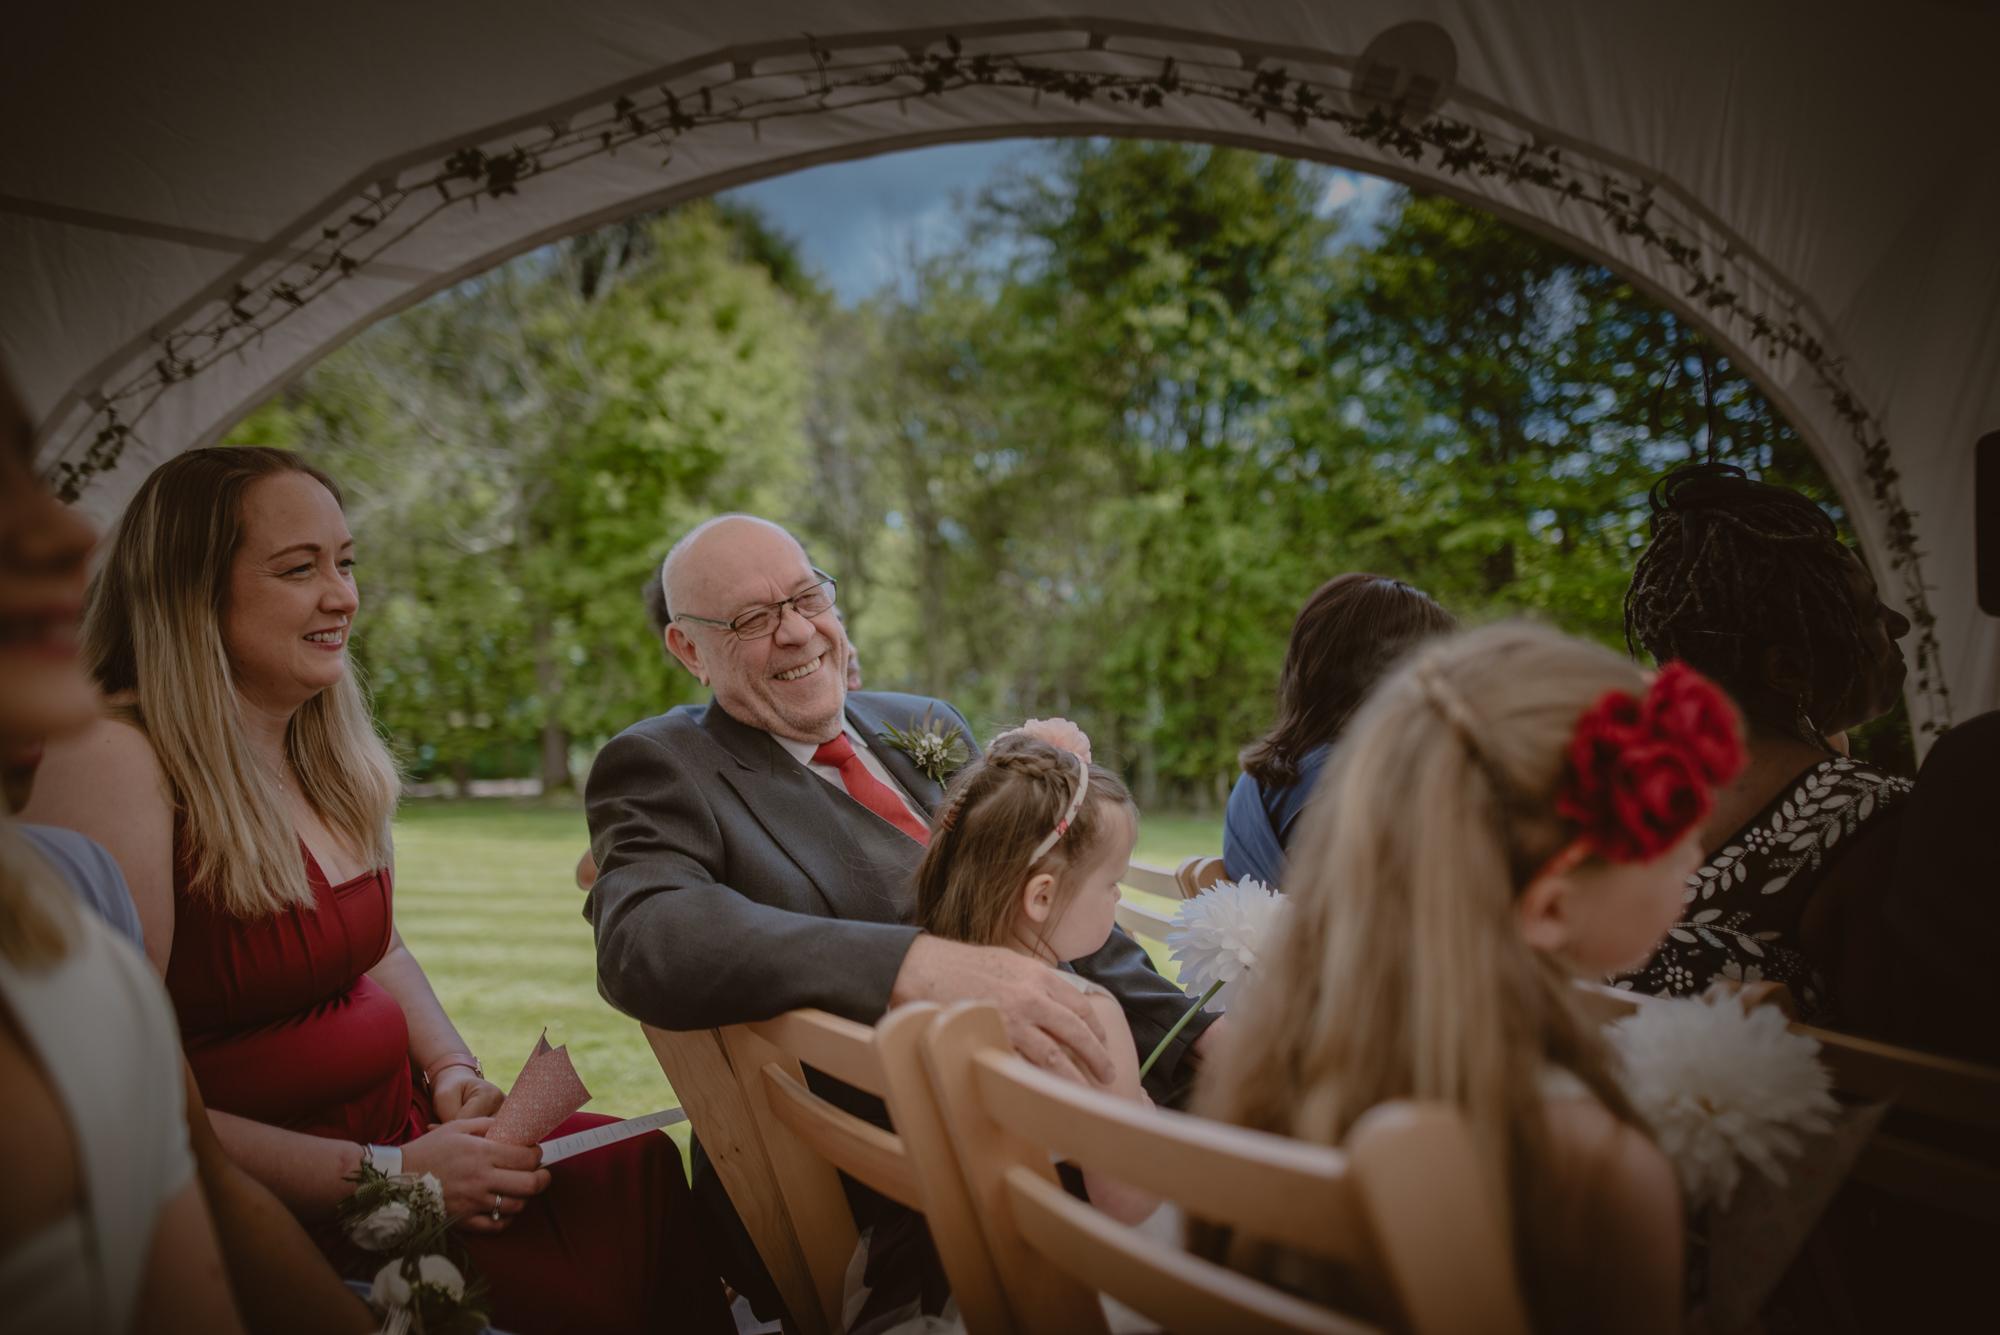 Jacqueline-Gareth-Wedding-Westmead-Events-Surrey-Manu-Mendoza-Wedding-Photography-254.jpg